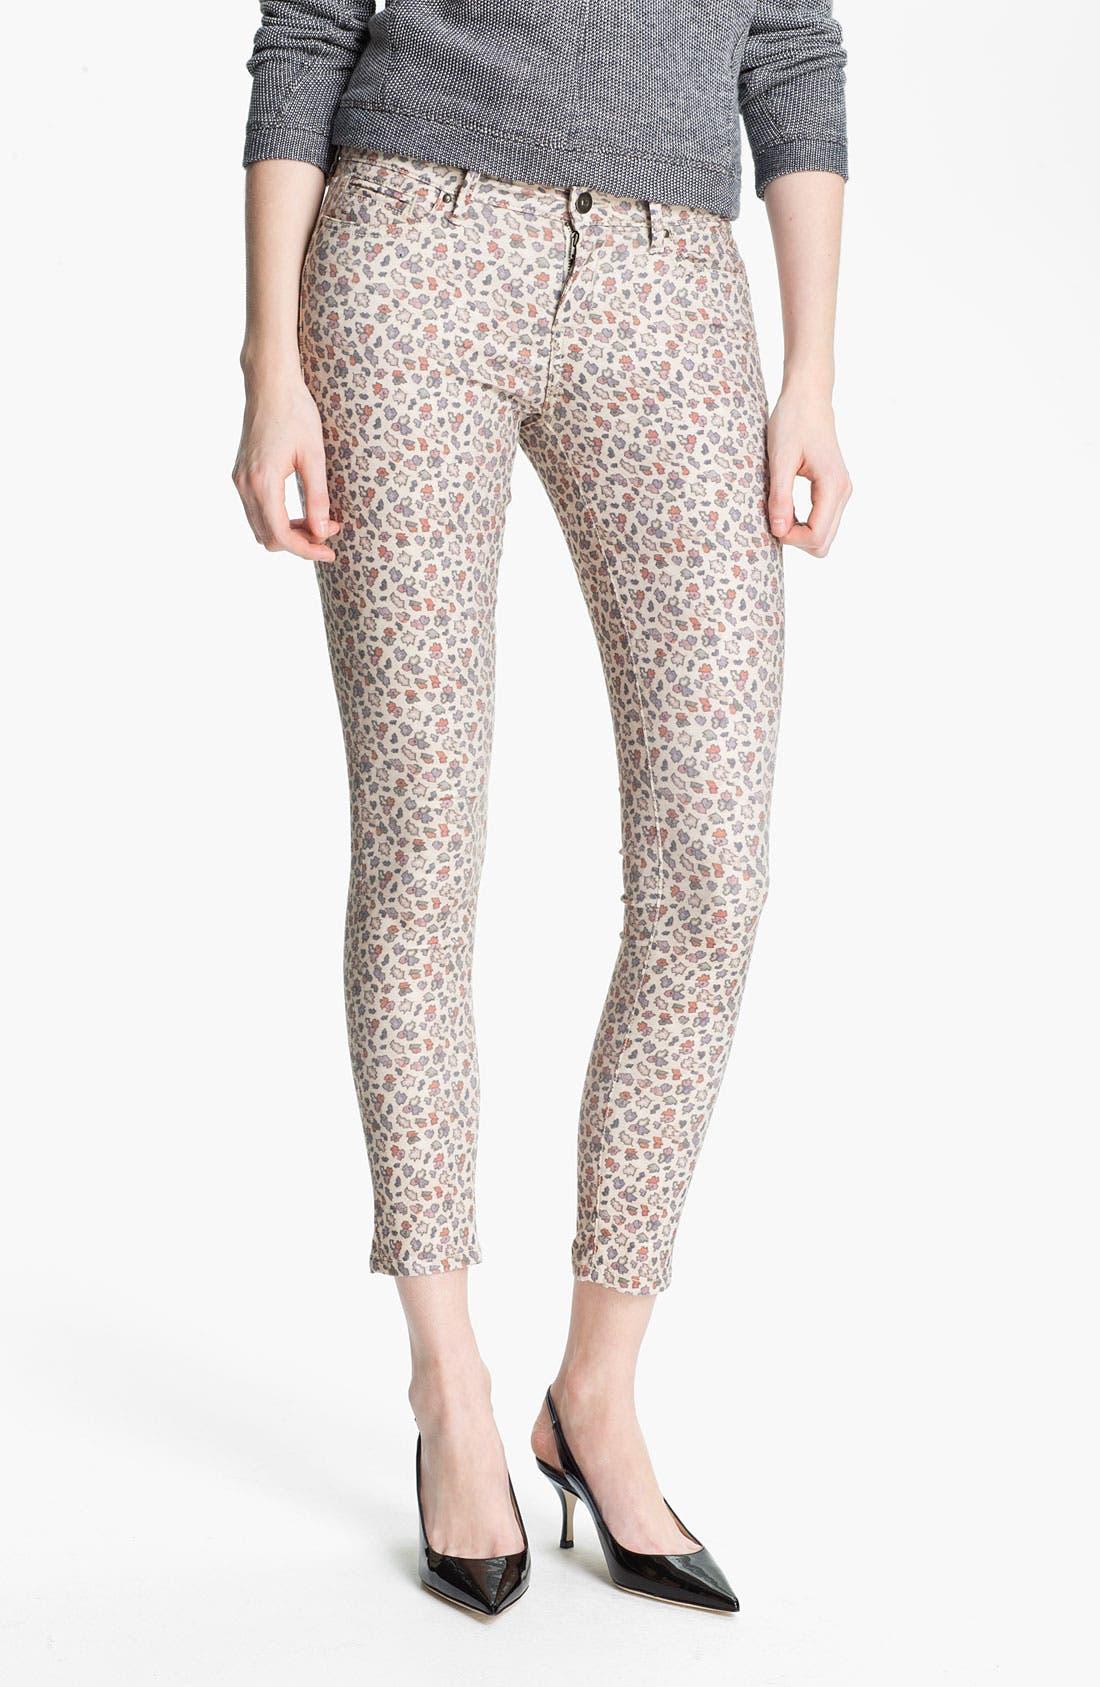 Alternate Image 1 Selected - Twenty8Twelve 'Ashberry' Skinny Print Stretch Jeans